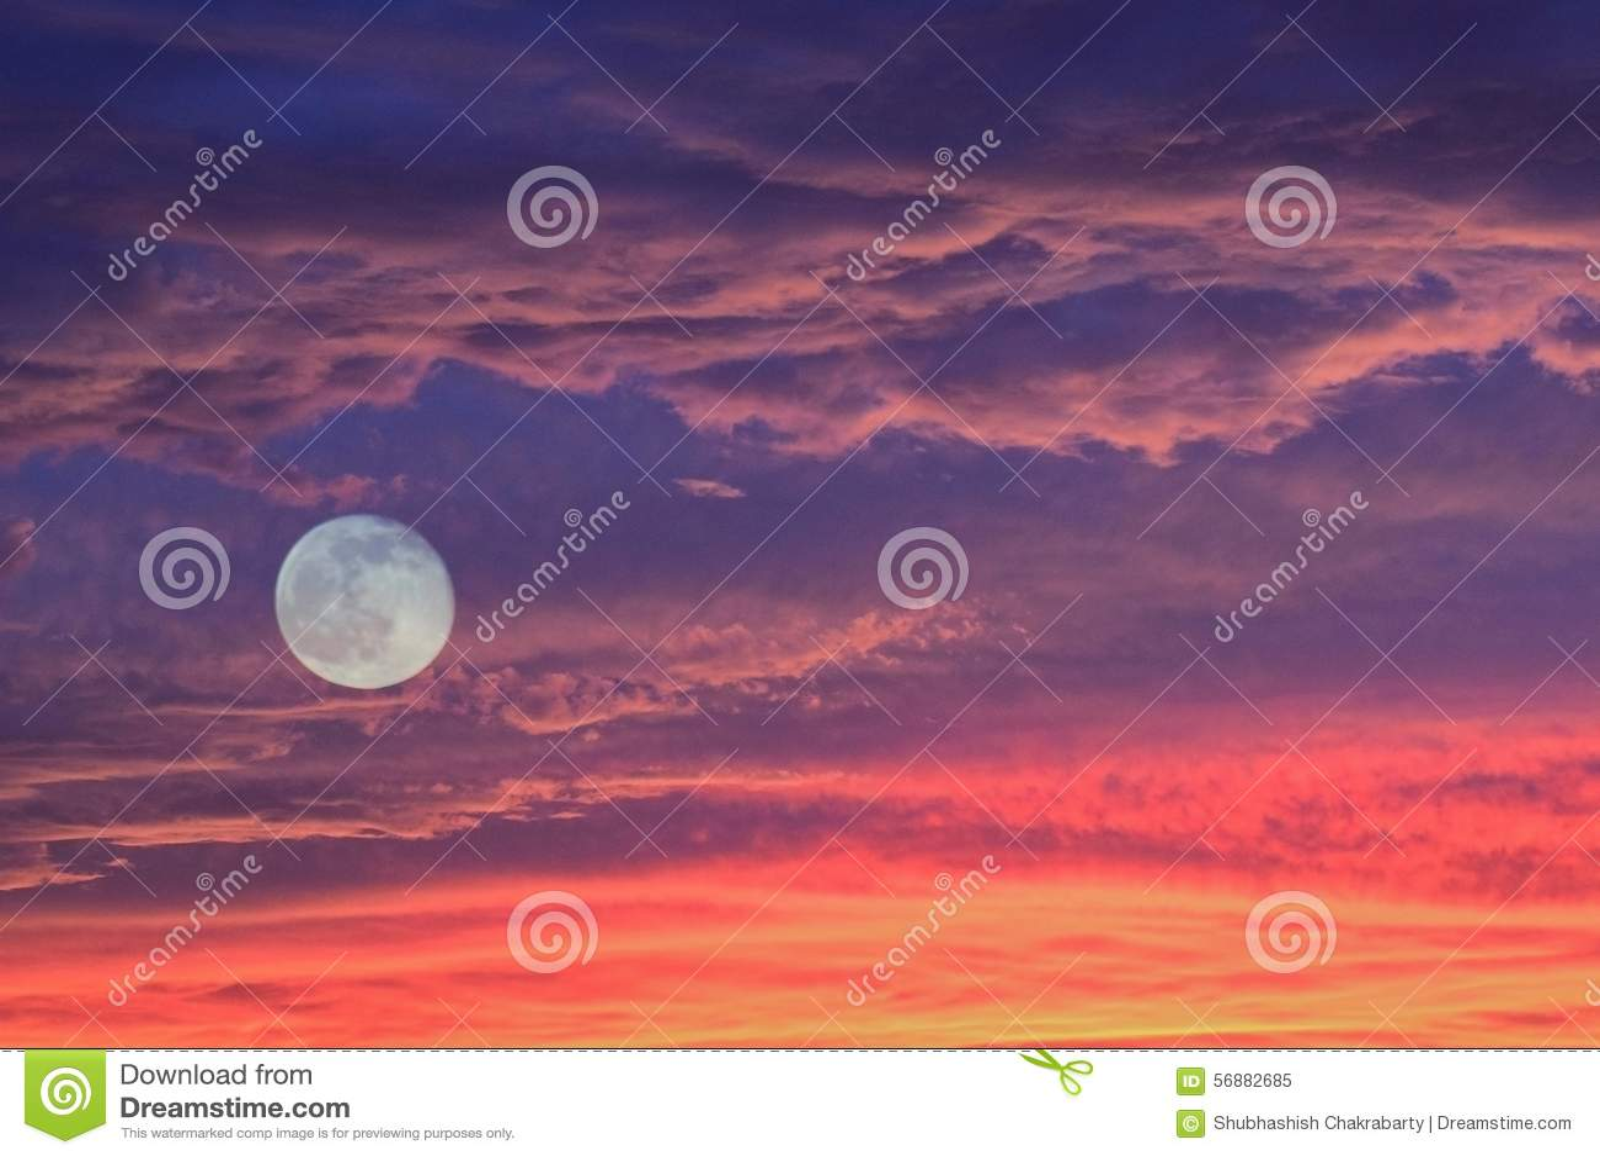 Nuvole & luna piena di tramonto